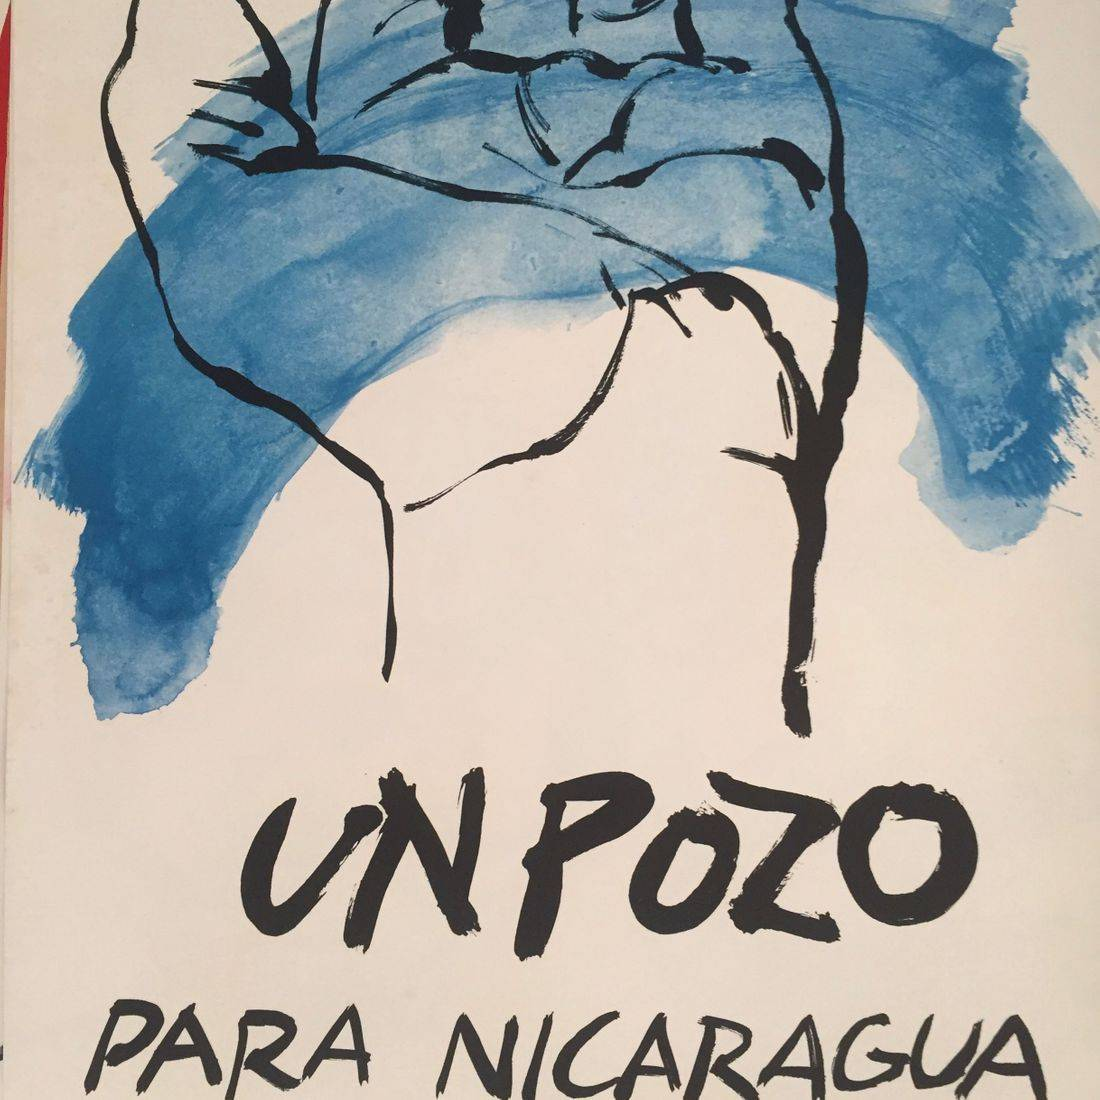 José Balmes, poster signed, Paris, 1983